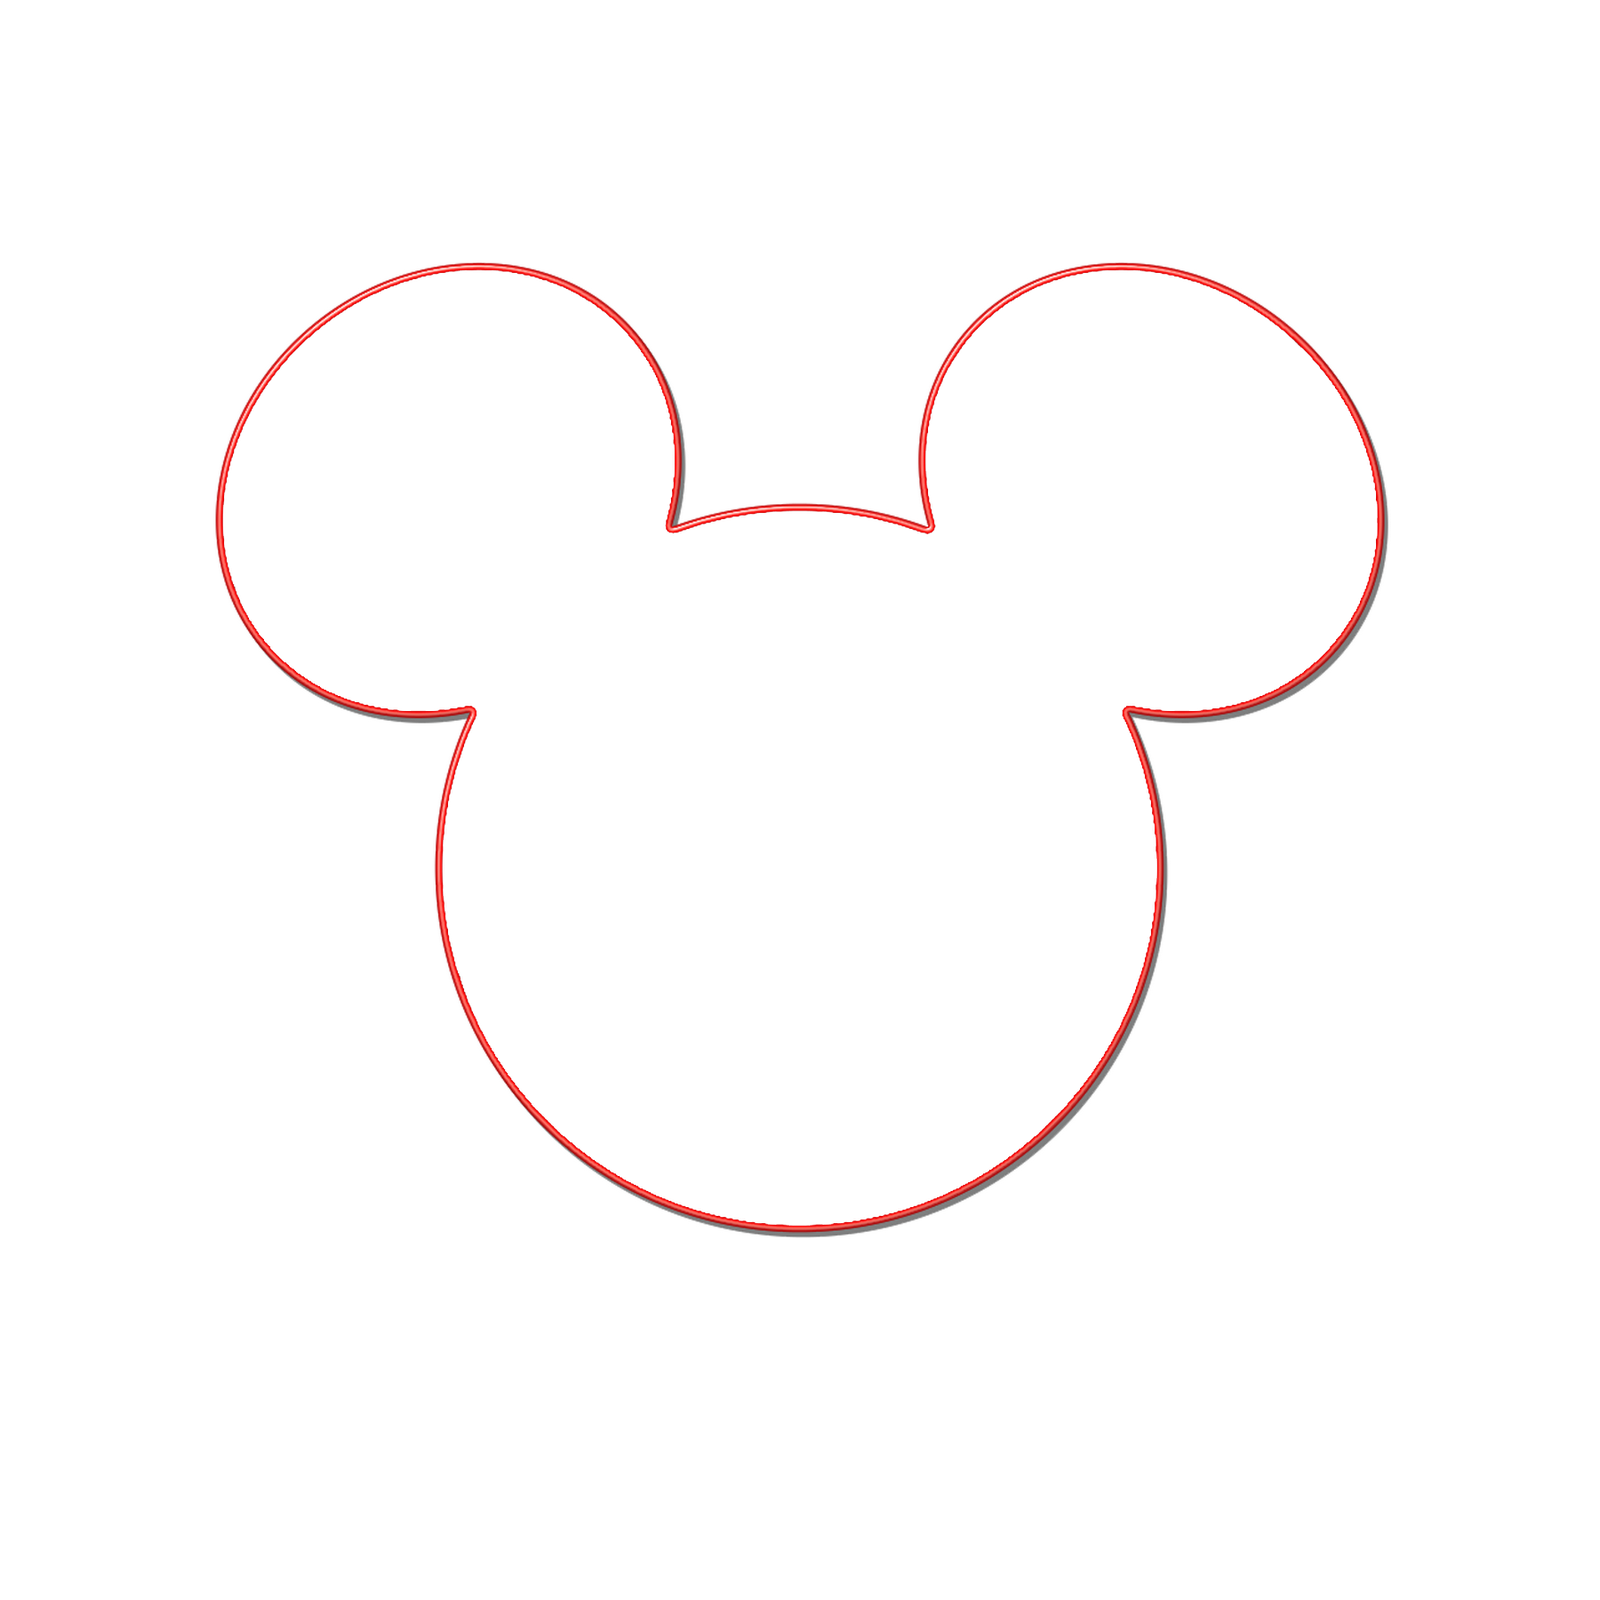 mickey mouse clipart u0026middot; head c-mickey mouse clipart u0026middot; head clipart u0026middot; proof clipart u0026middot; iq clipart-3